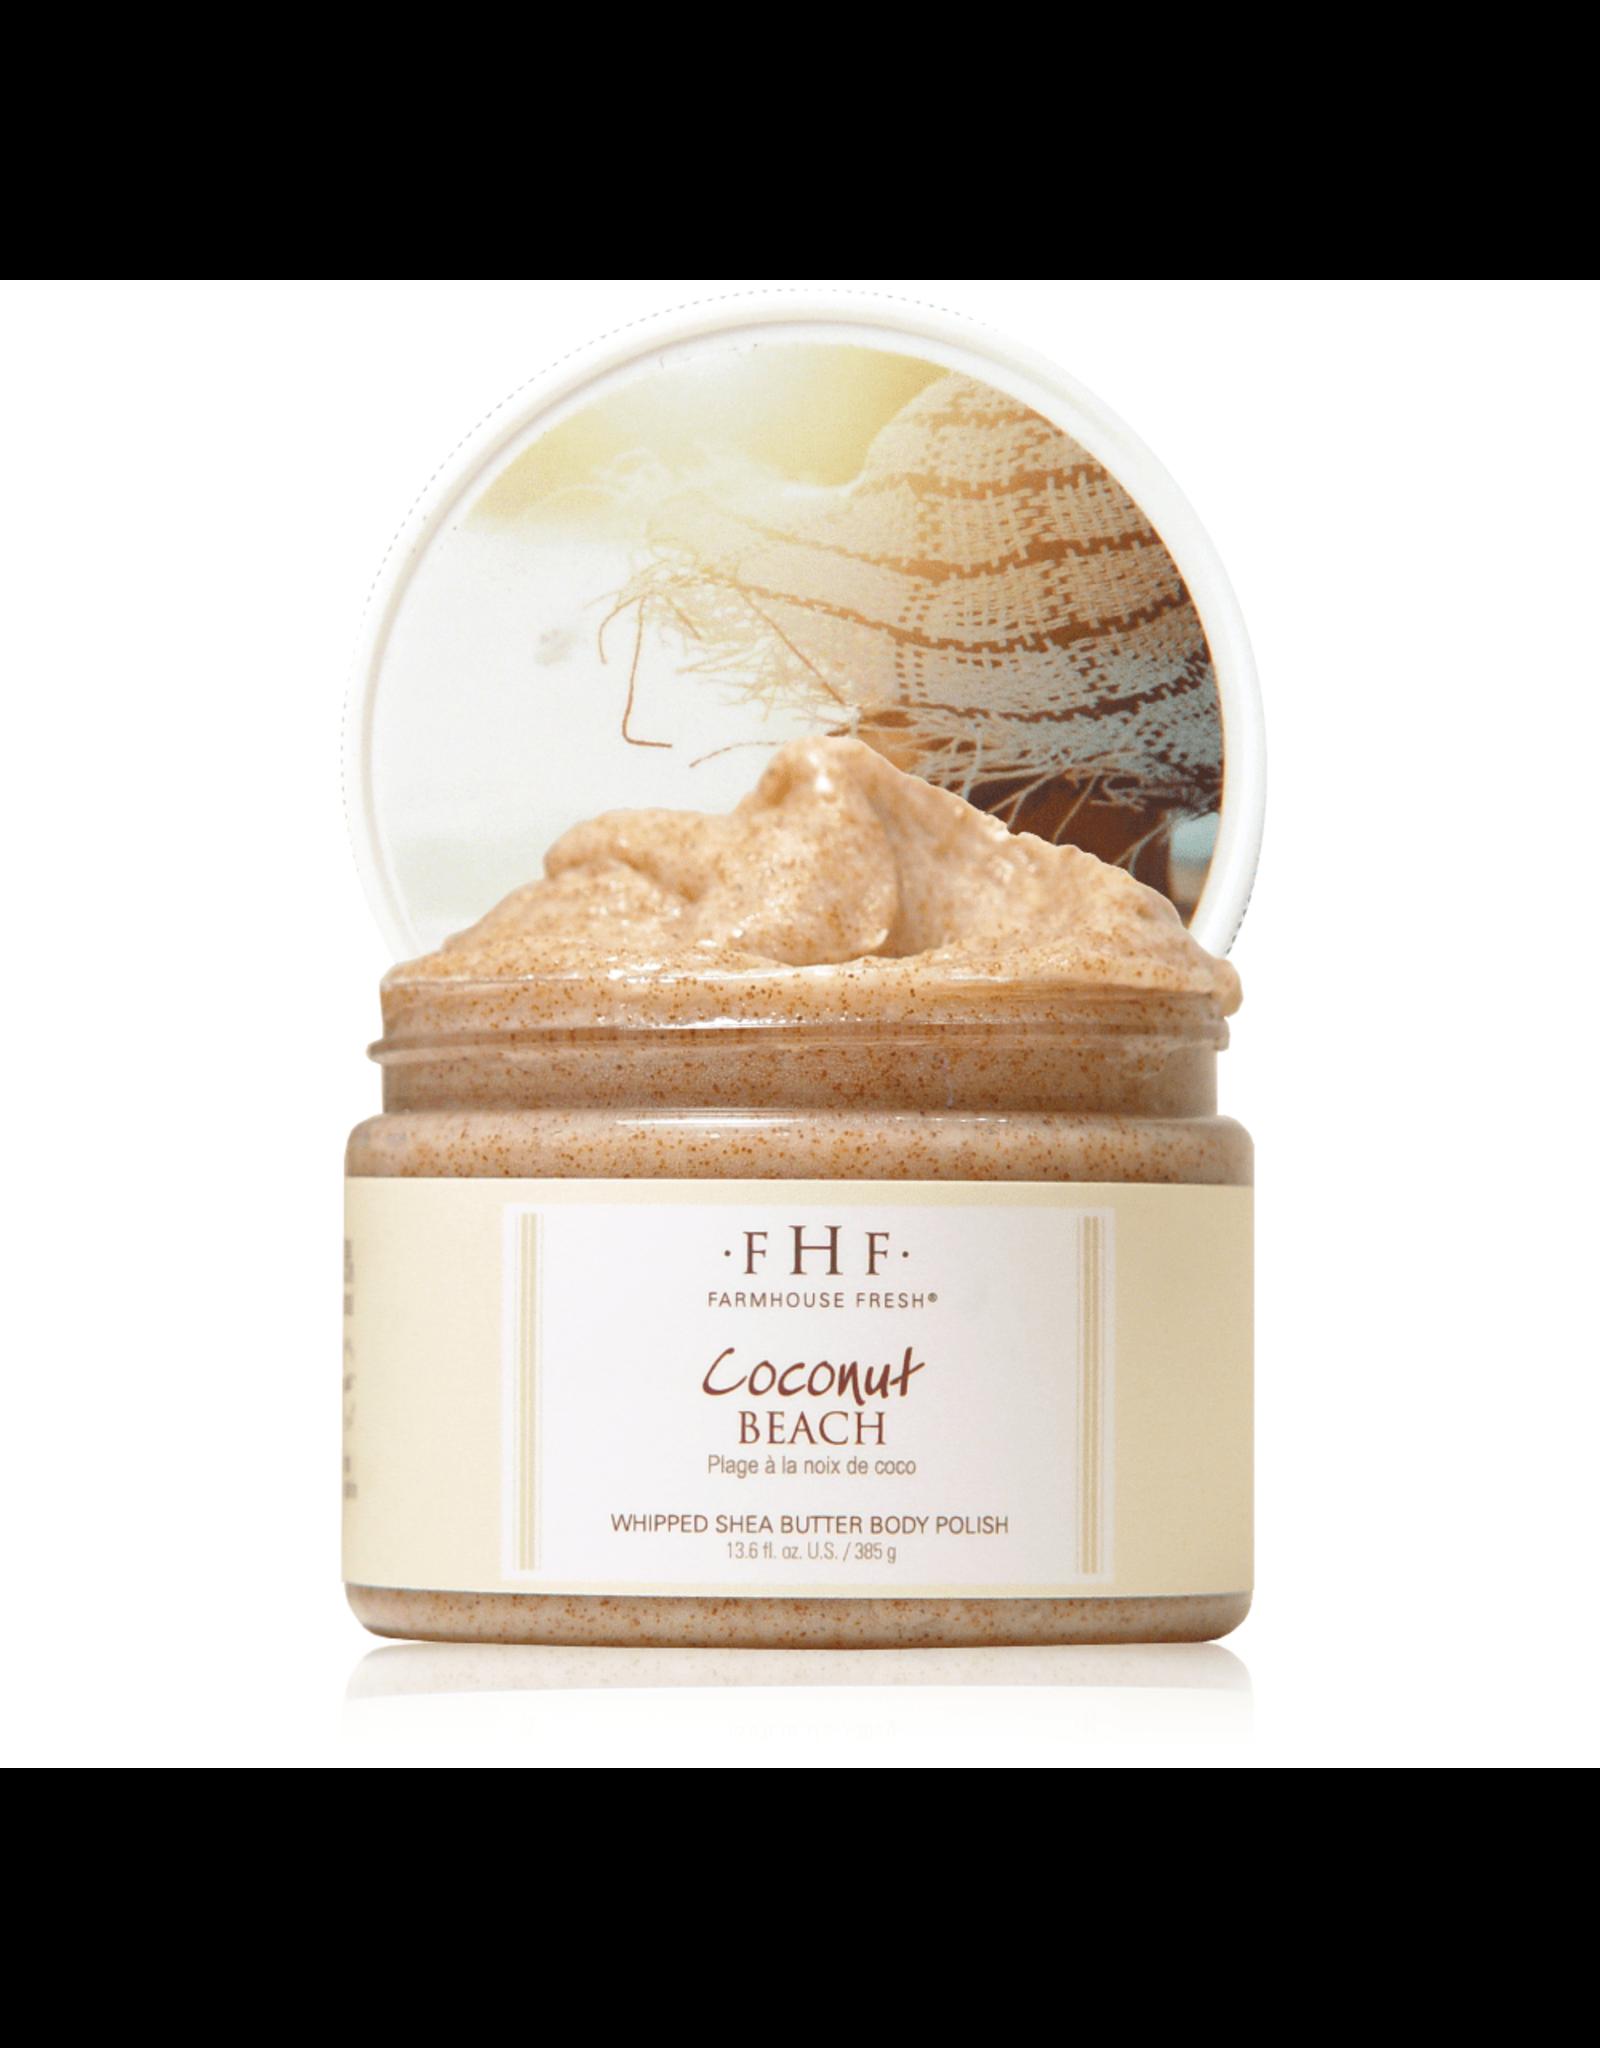 Farmhouse Fresh Coconut Beach® Whipped Shea Butter Body Polish 12oz